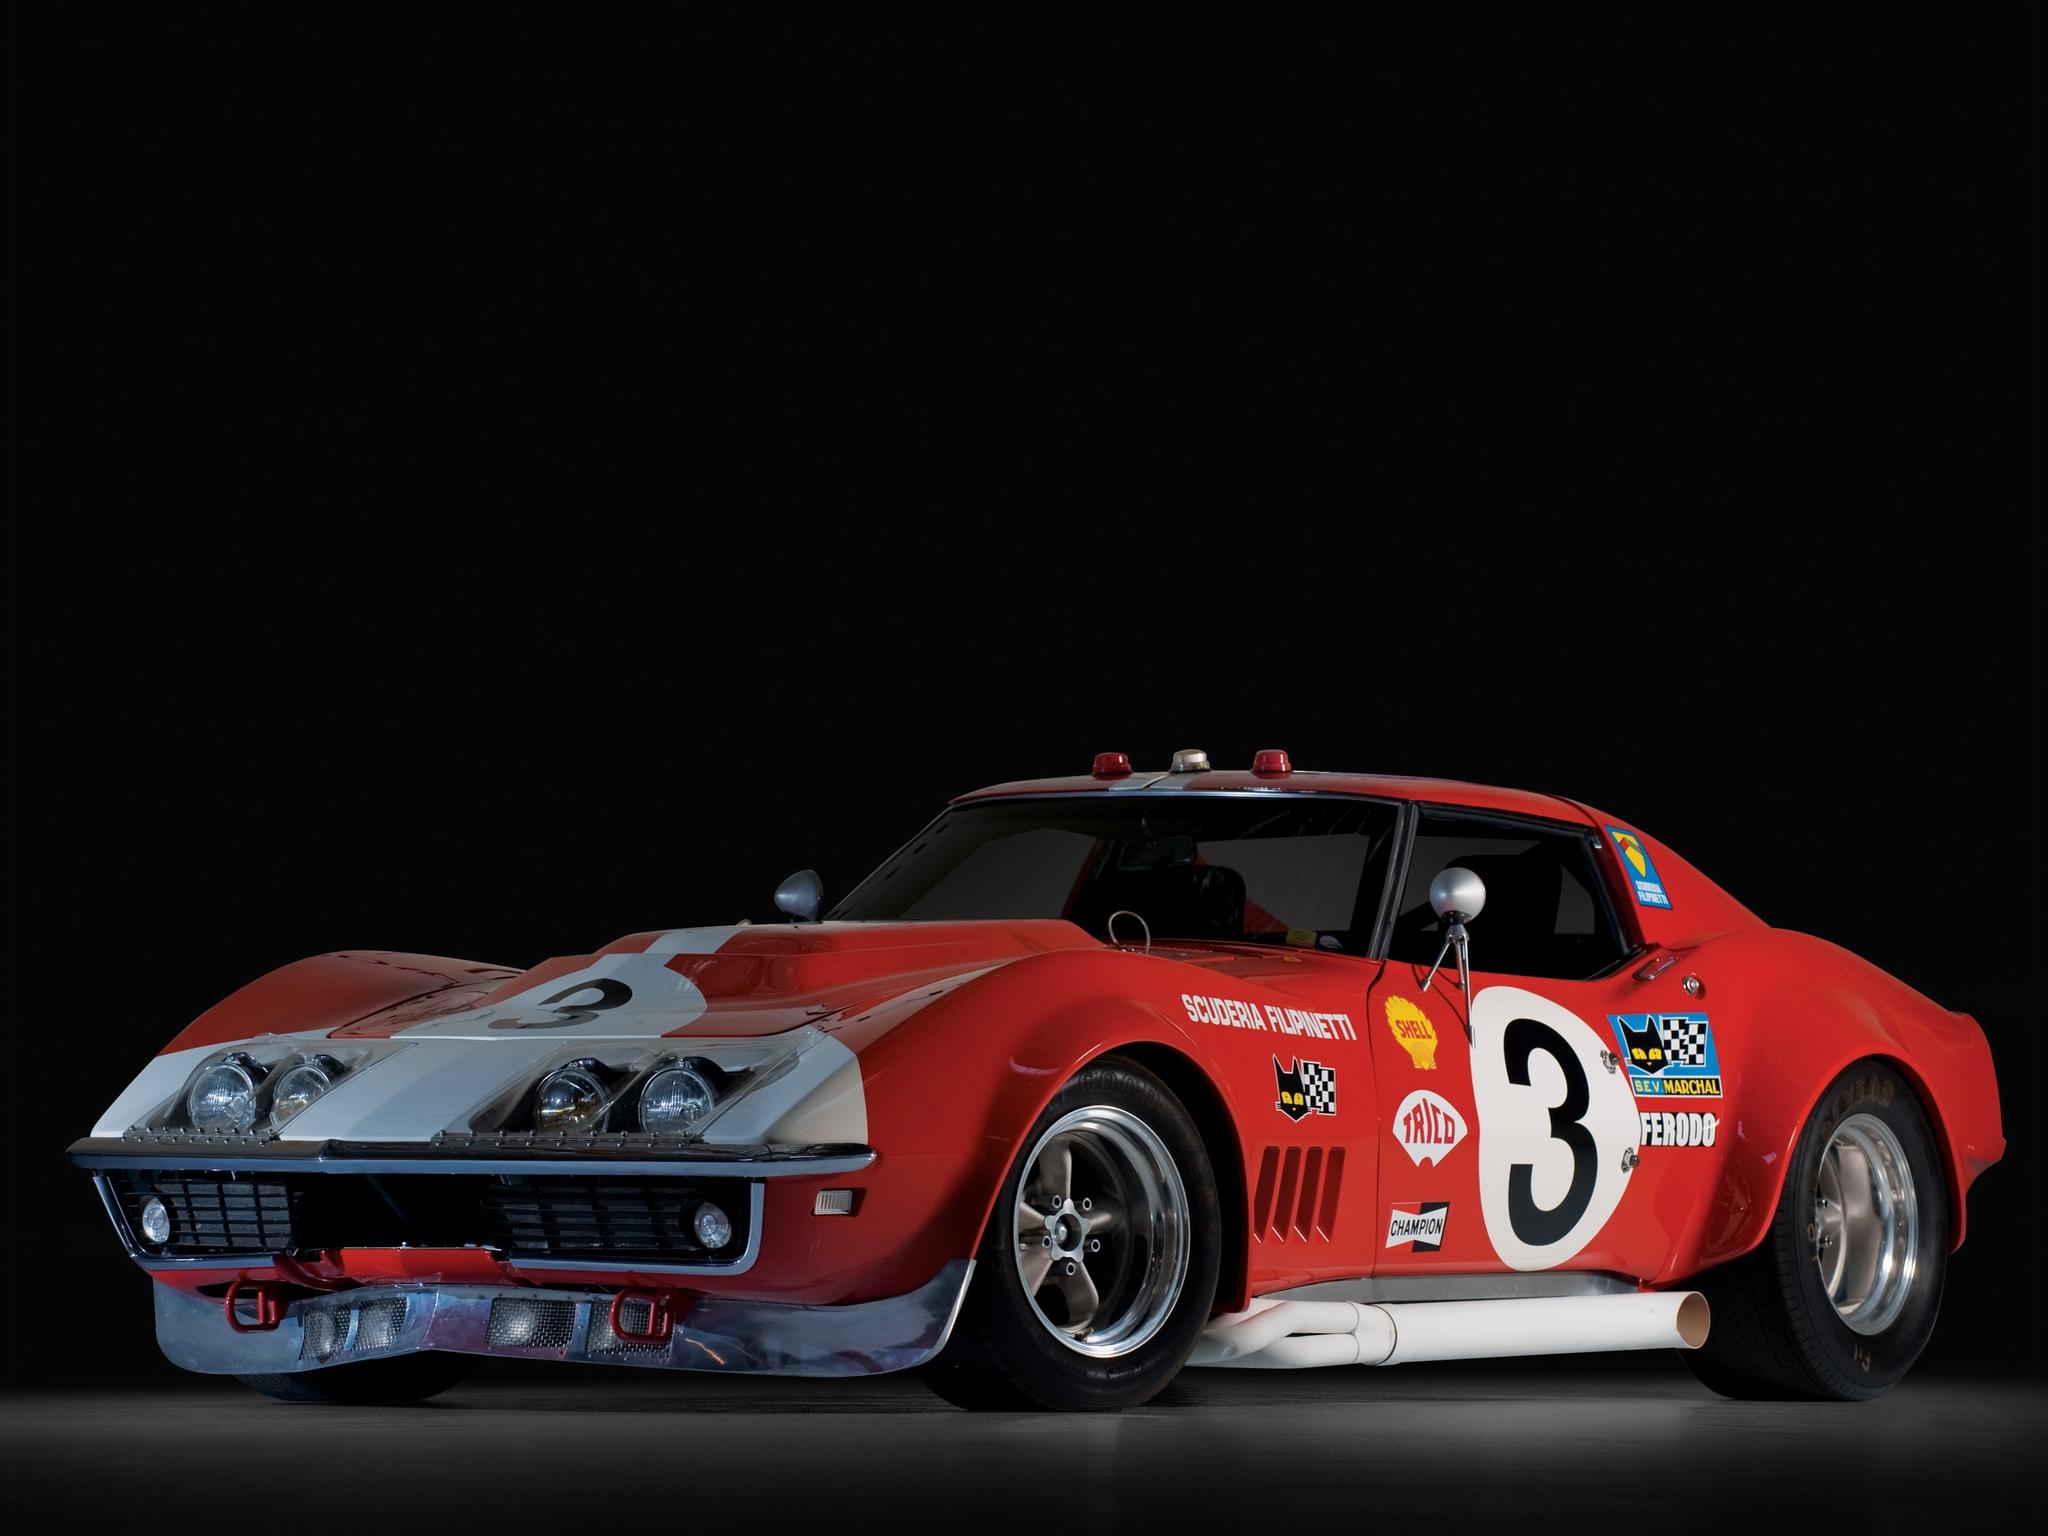 Corvette L88 Race Car C 3 racing supercar muscle classic f wallpaper 2048x1536